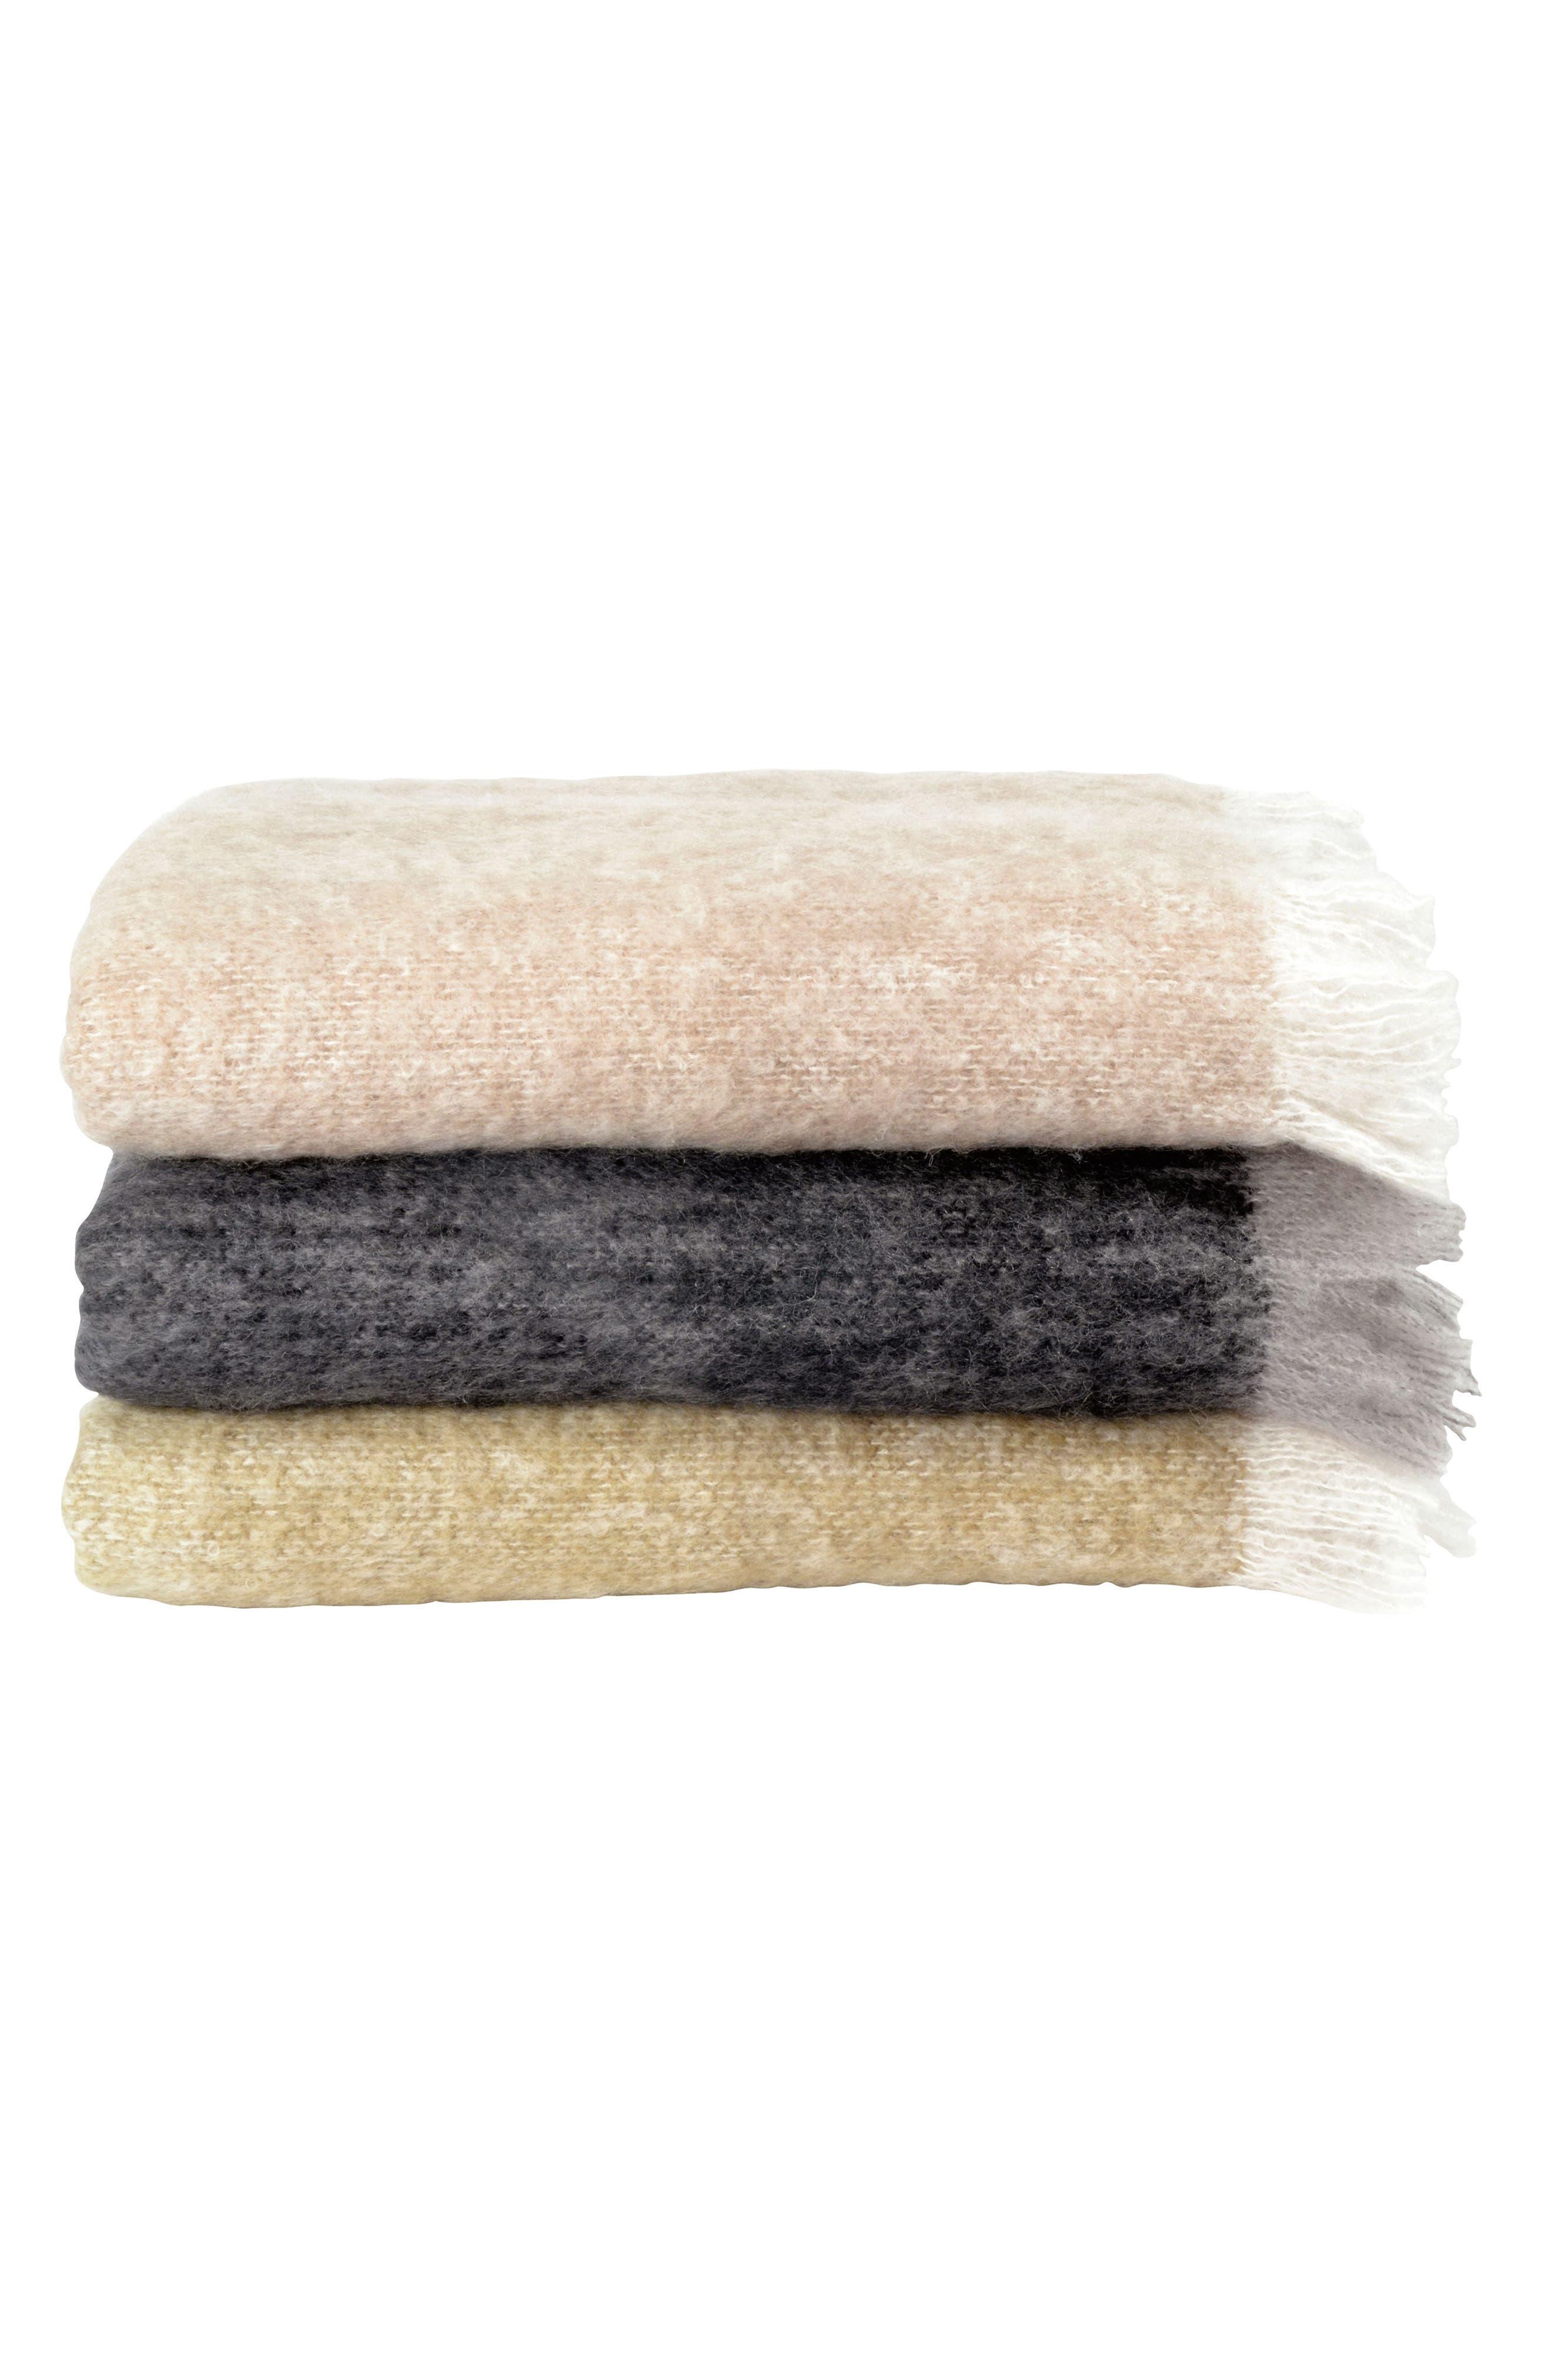 Alternate Image 3  - Michael Aram Mohair & Wool Throw